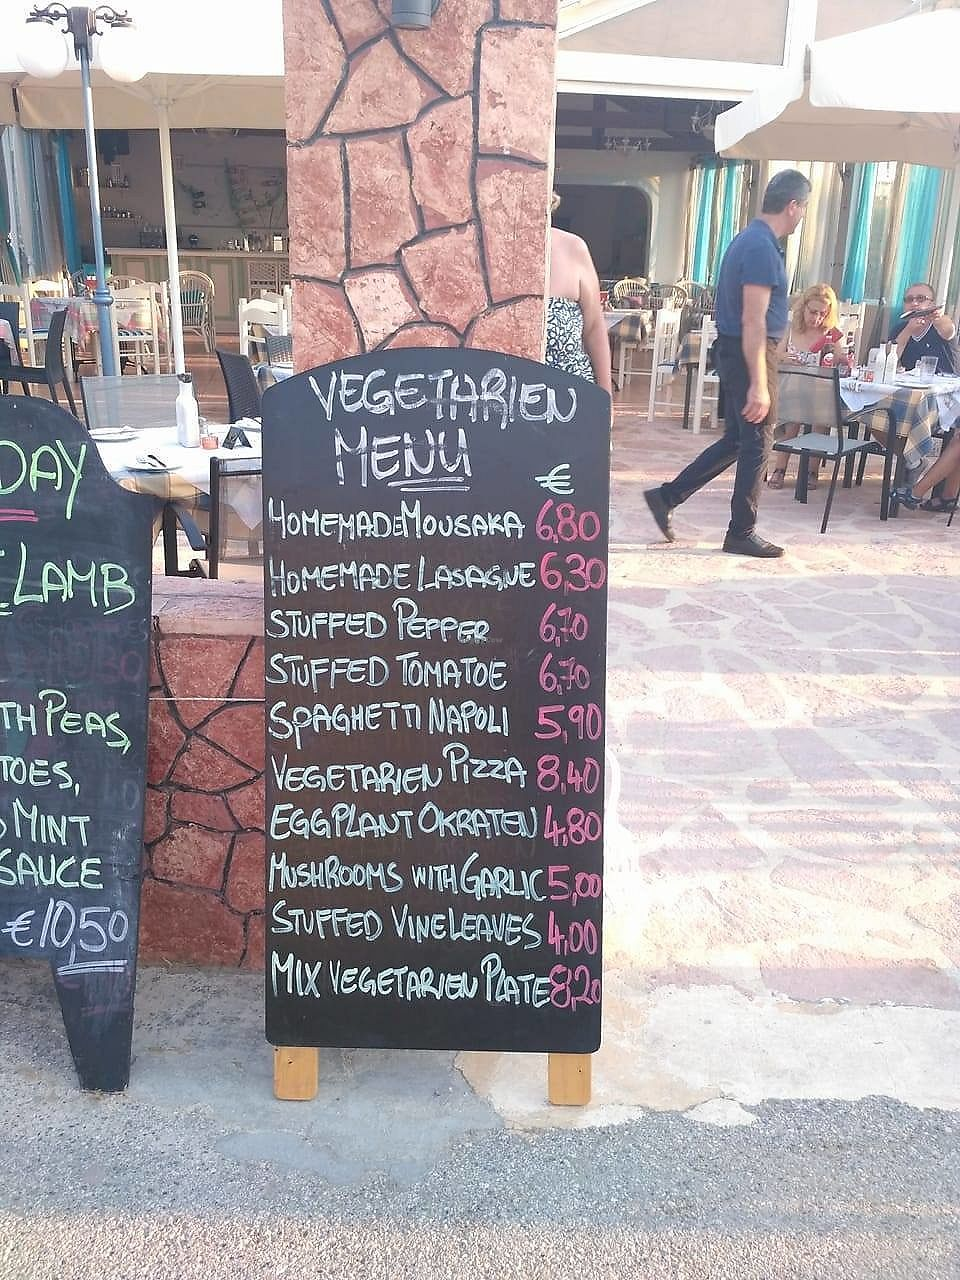 "Photo of Taverna Kavvadias  by <a href=""/members/profile/aga.mika"">aga.mika</a> <br/>Vege menu  <br/> September 6, 2017  - <a href='/contact/abuse/image/99021/301436'>Report</a>"